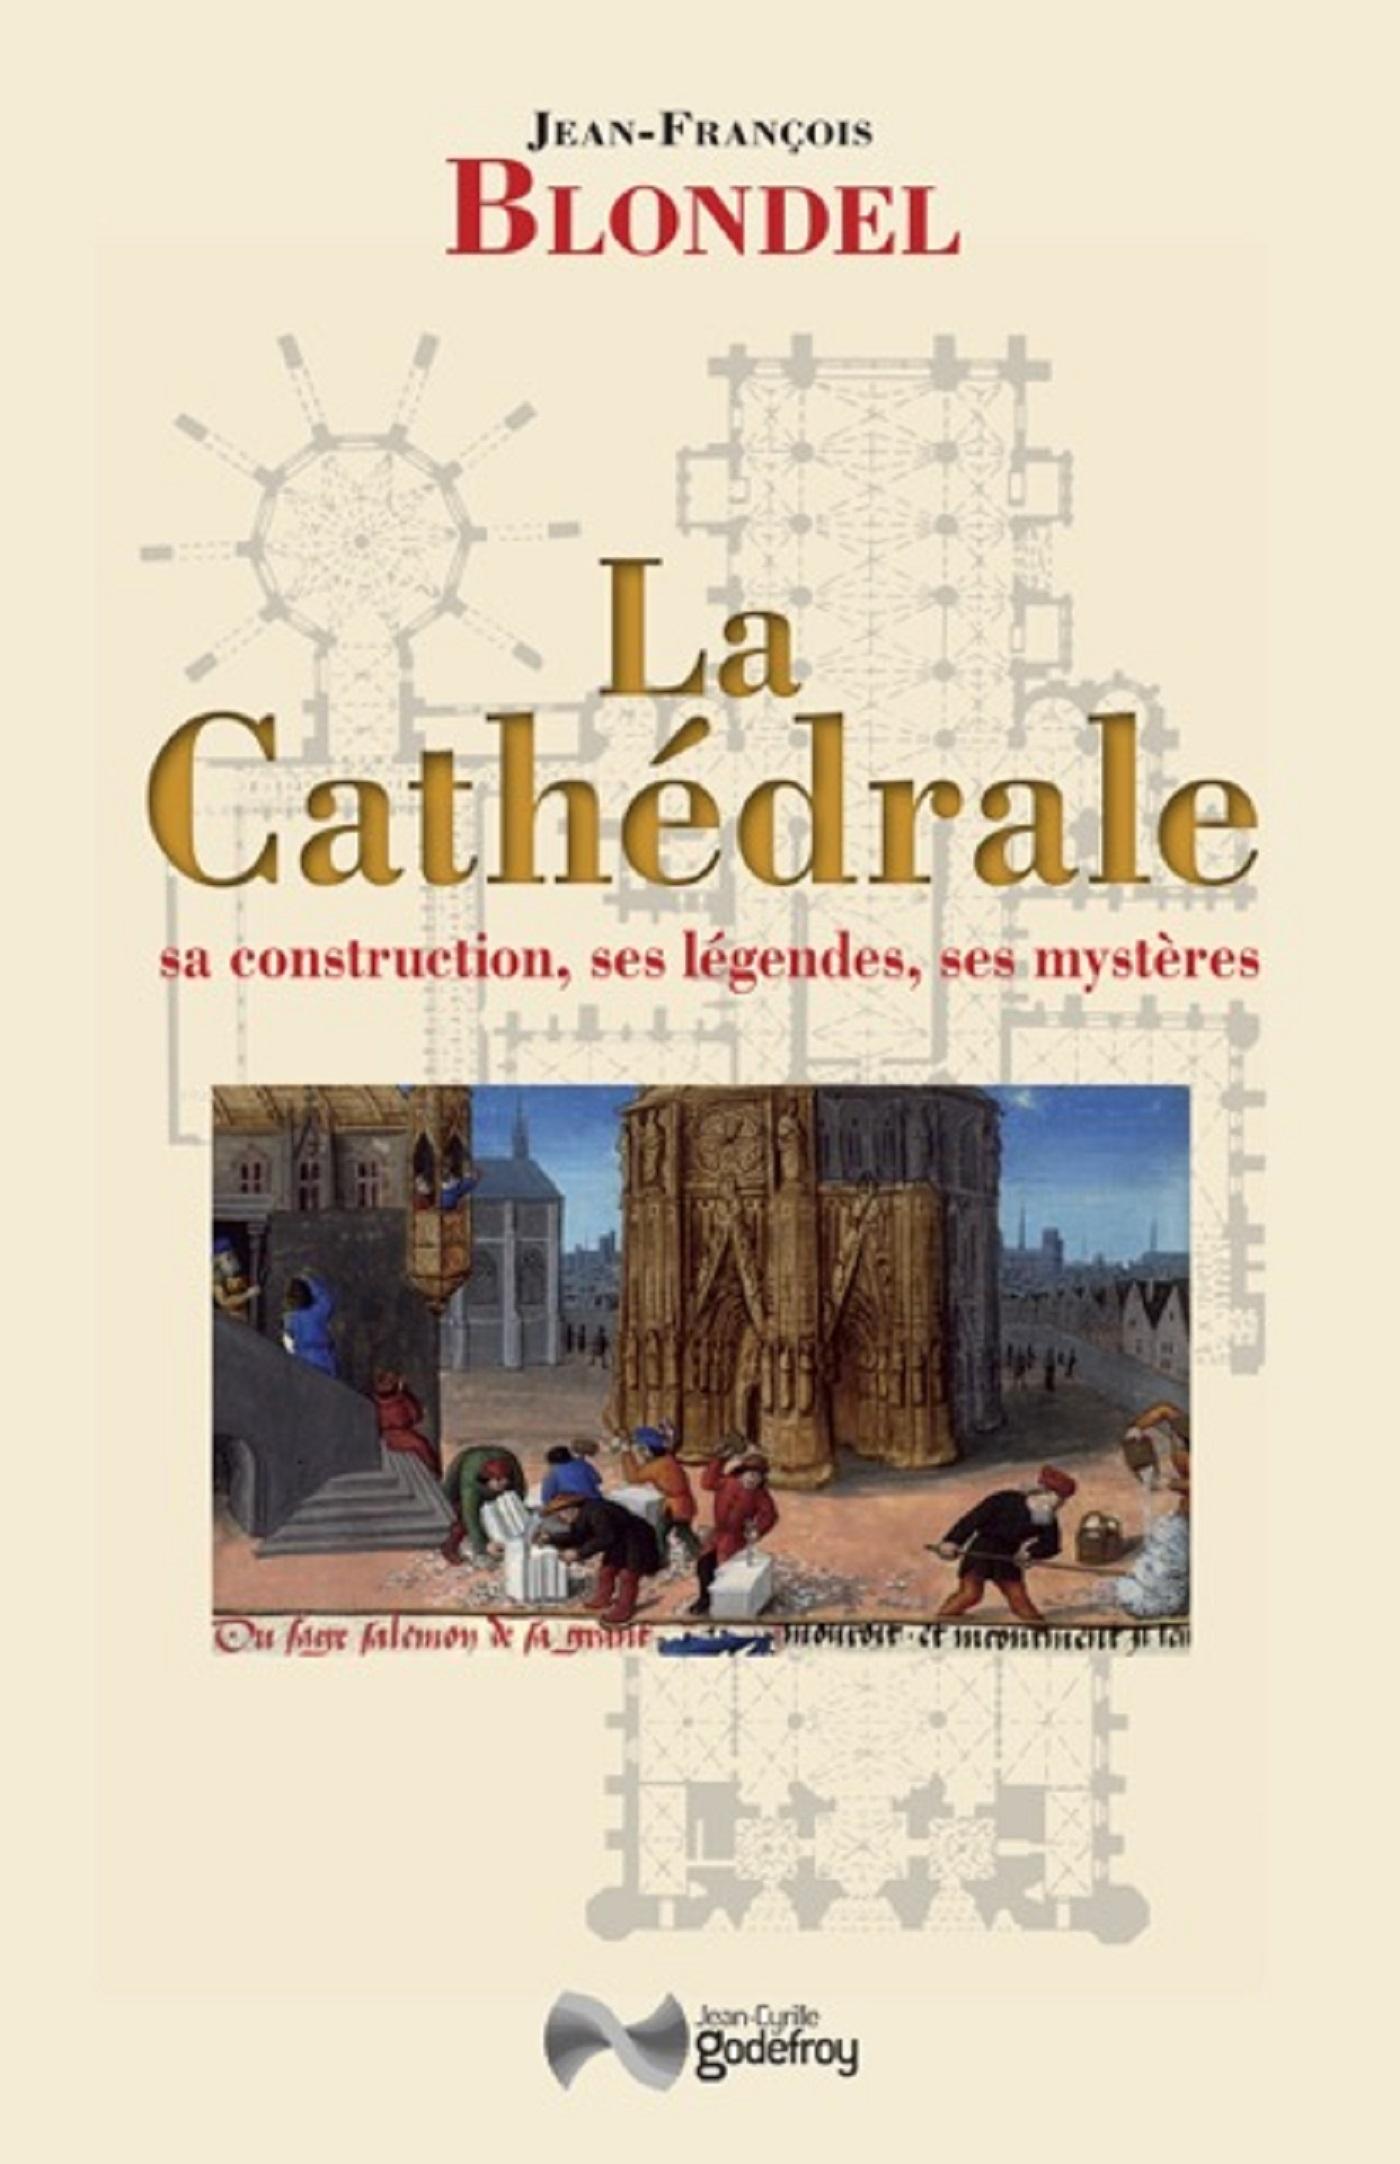 LA CATHEDRALE - SA CONSTRUCTION, SES LEGENDES, SES MYSTERES